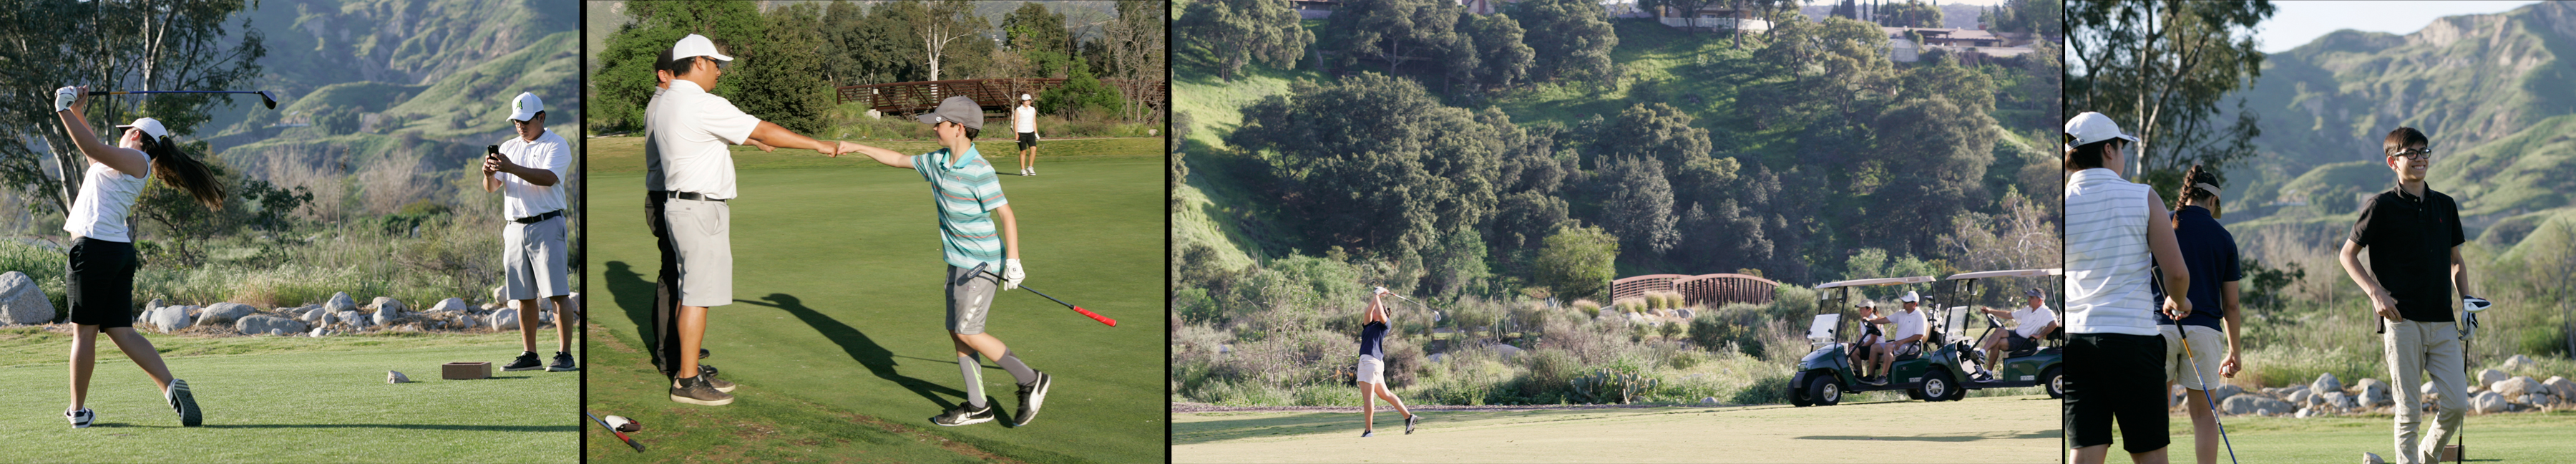 Los Angeles Junior Golf Academy JRL GOLF